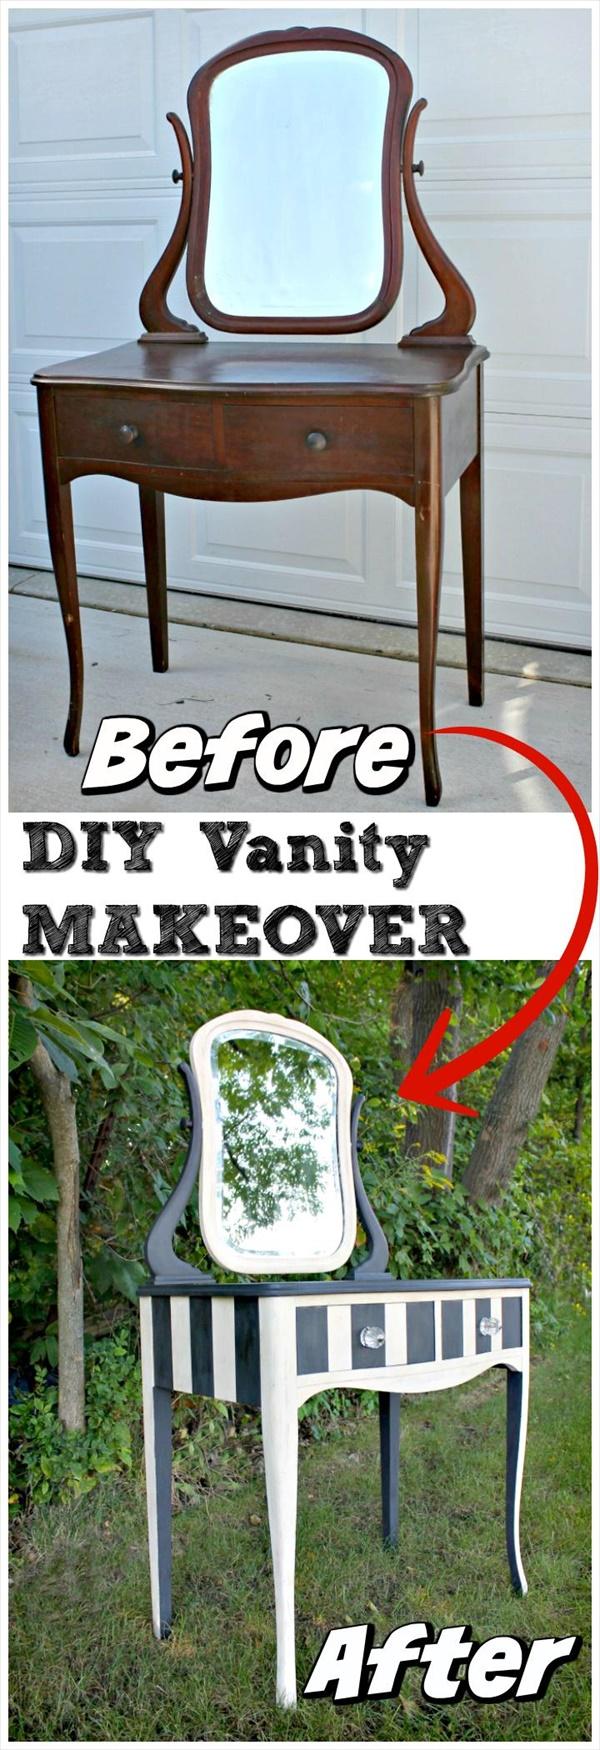 DIY Vanity Makeover Ideas 15 Amazing DIY Vanity Table Ideas You Must Try